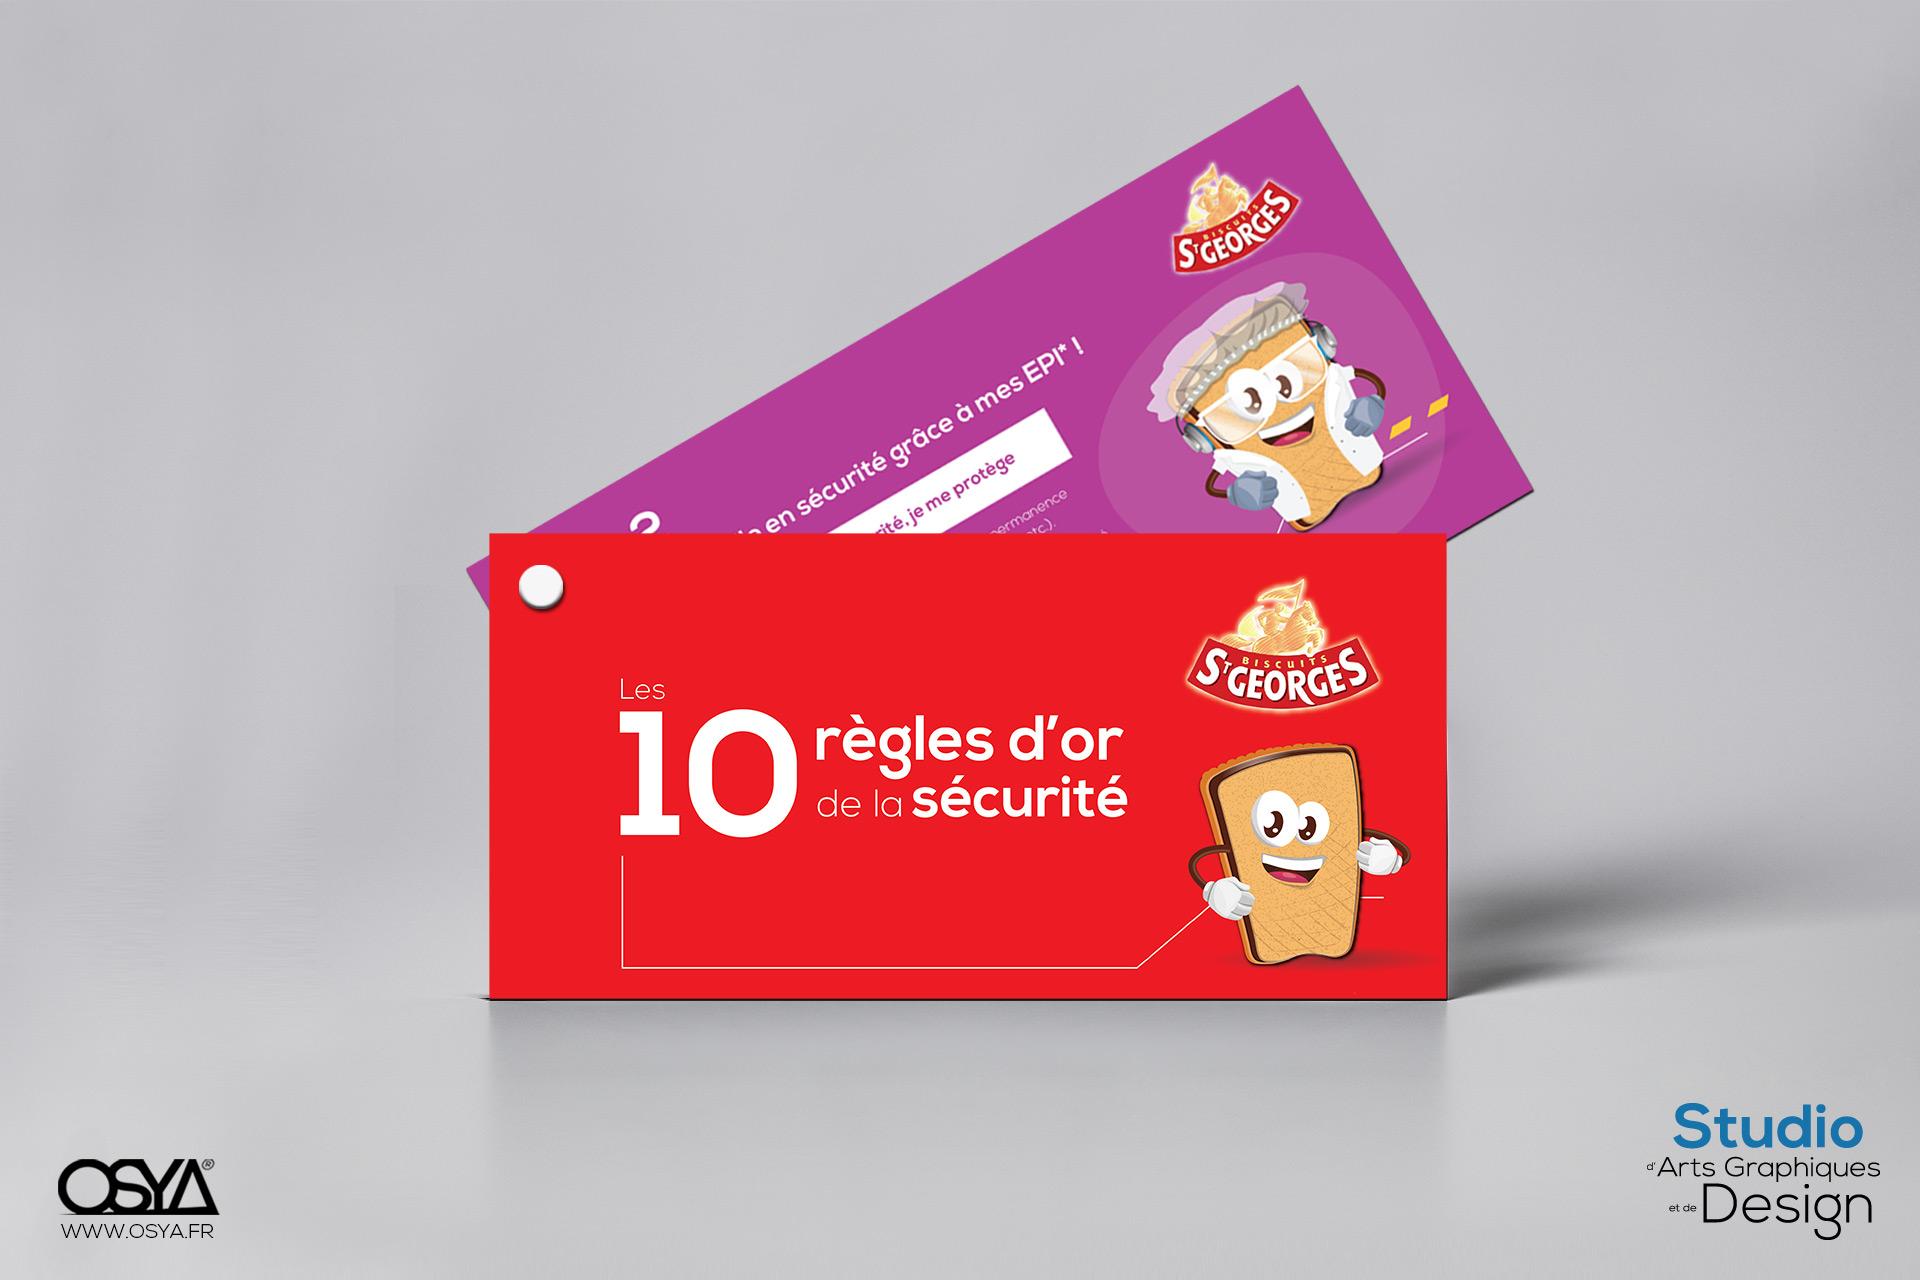 Livret-securite-biscuit-saint-georges-04